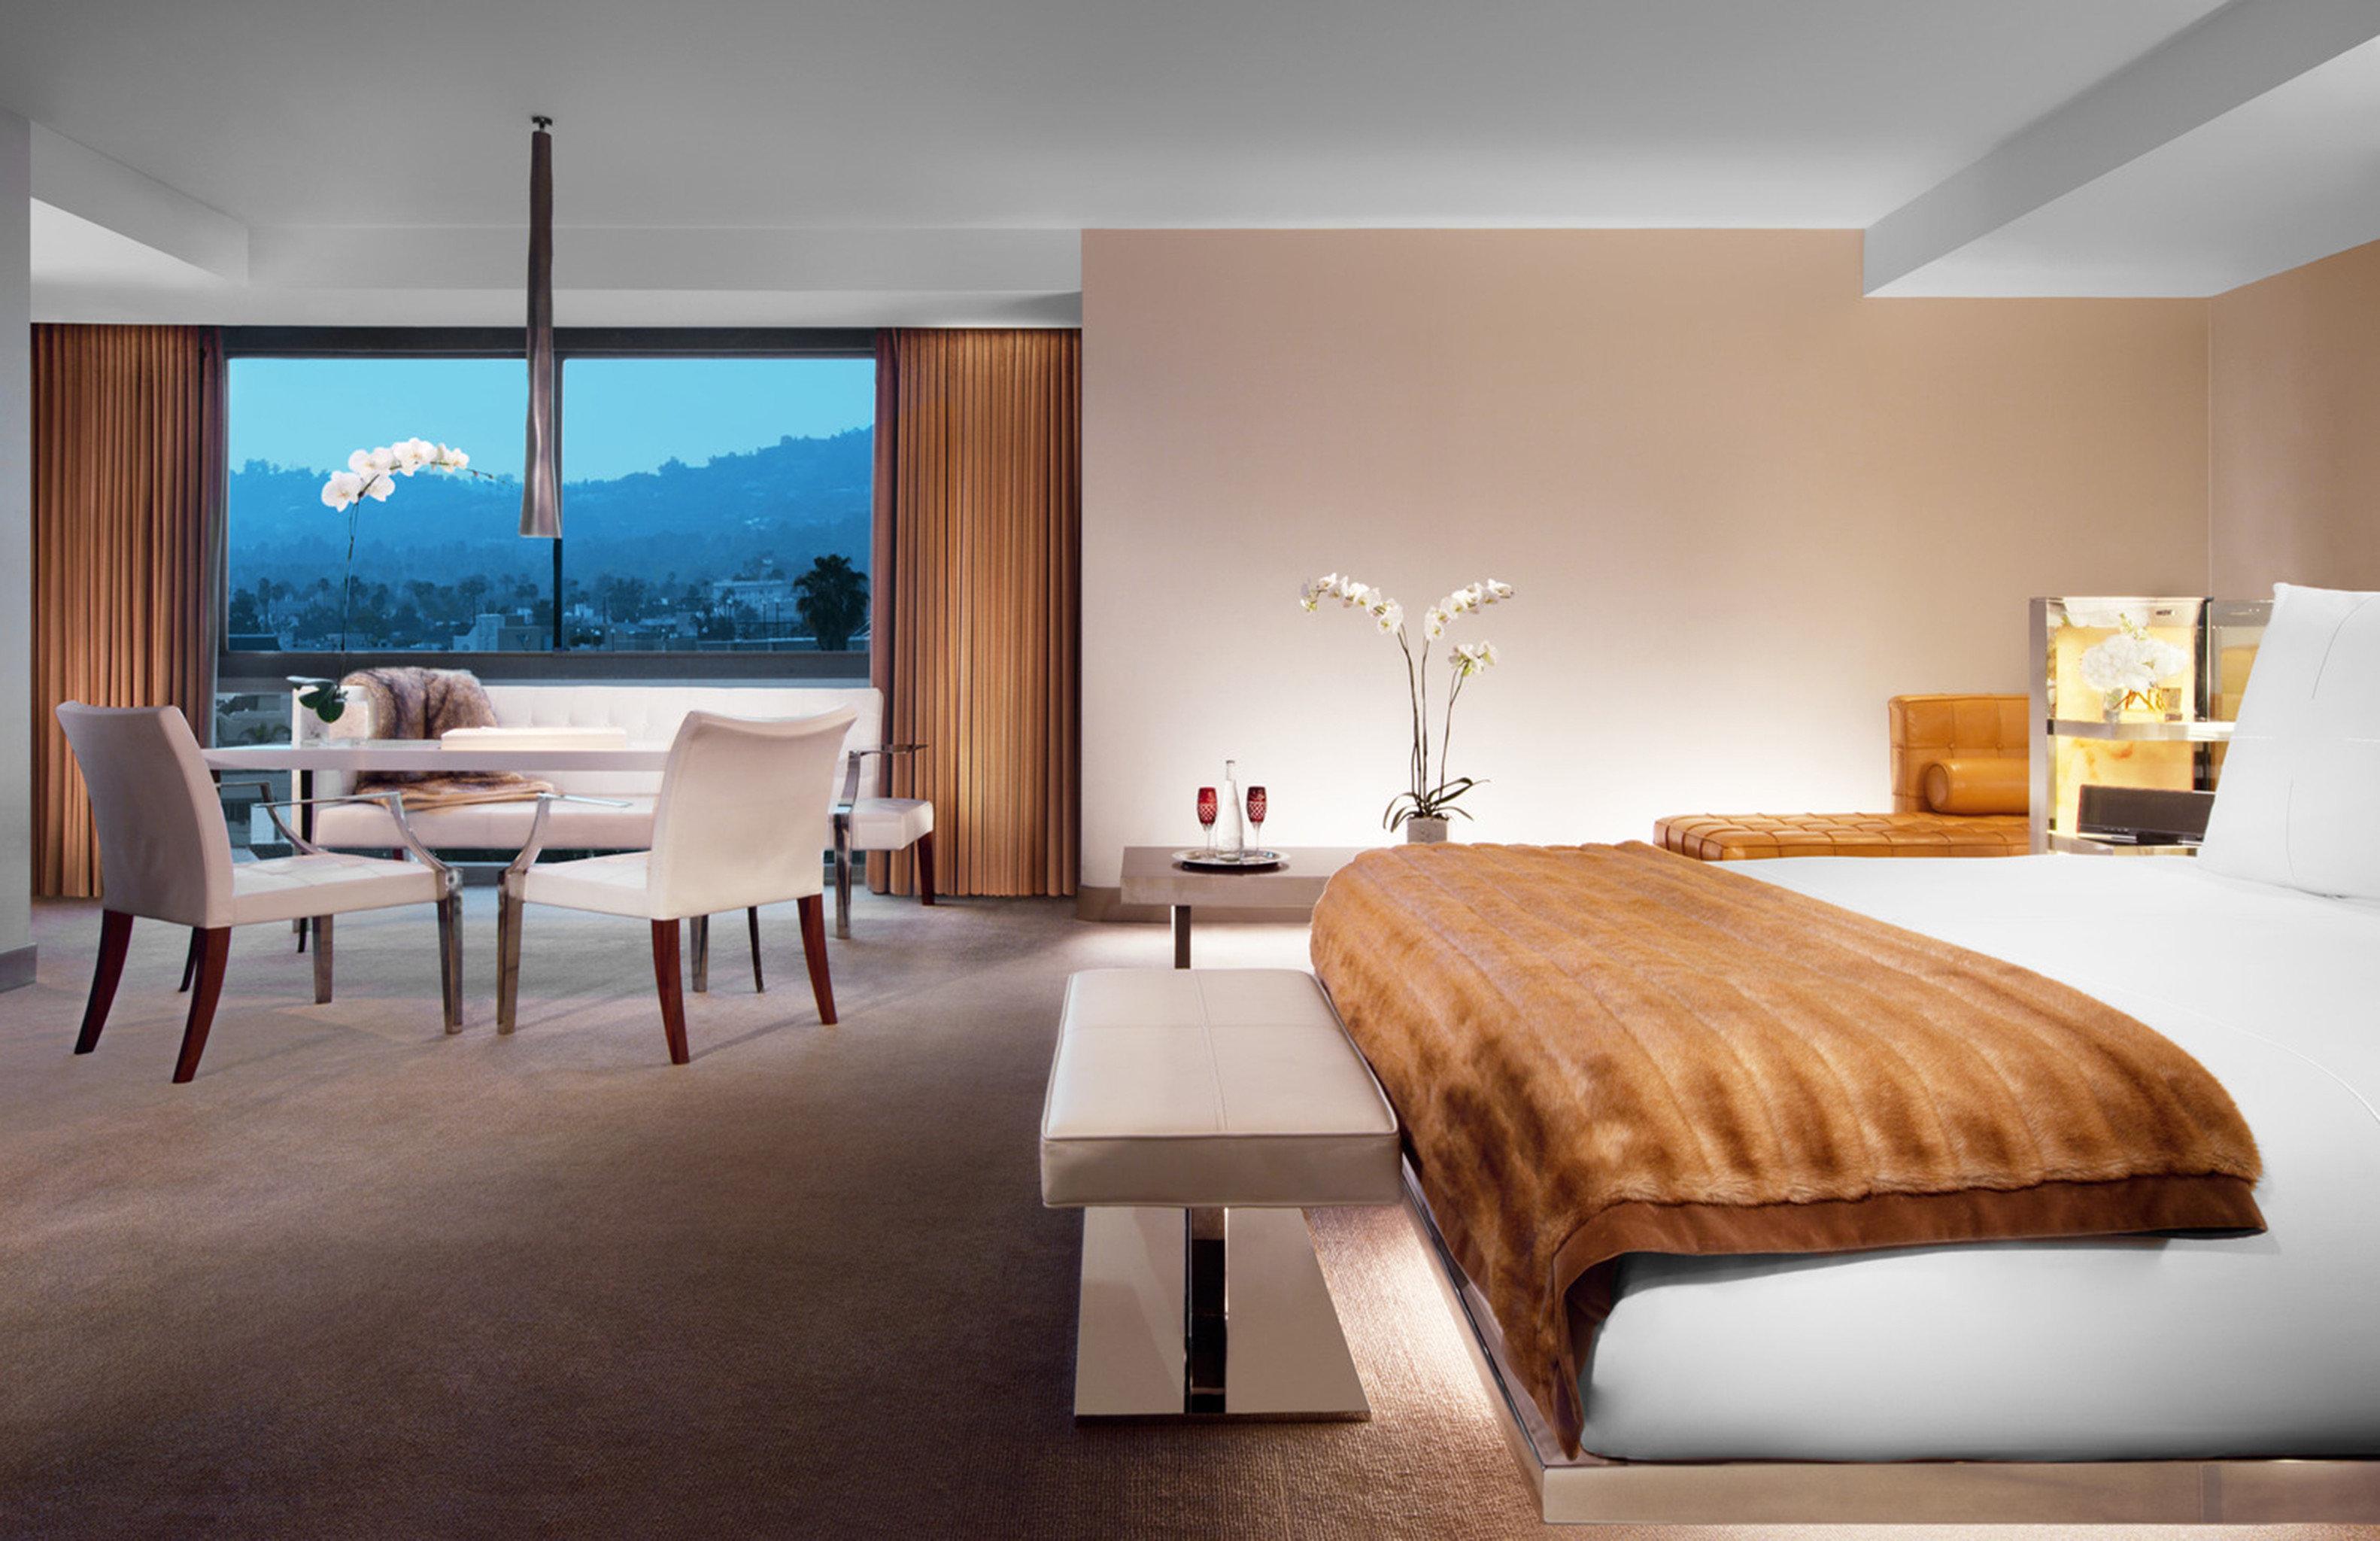 Bedroom City Elegant Modern Scenic views Suite property chair hardwood home living room Villa